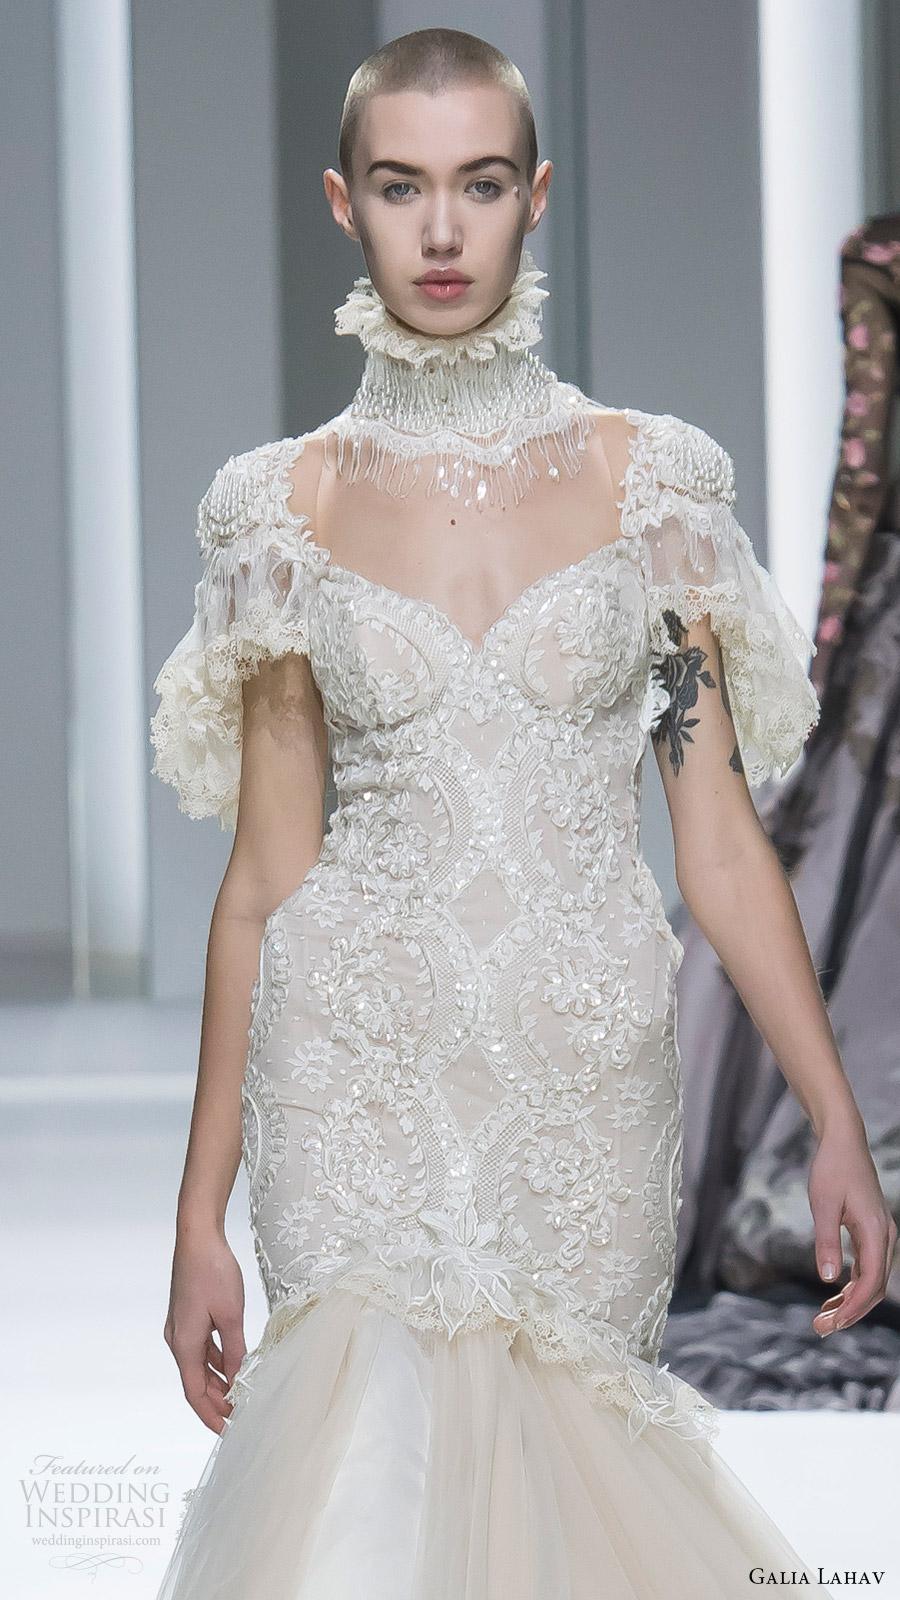 galia lahav haute couture spring 2017 (miss genesis) gown zfv